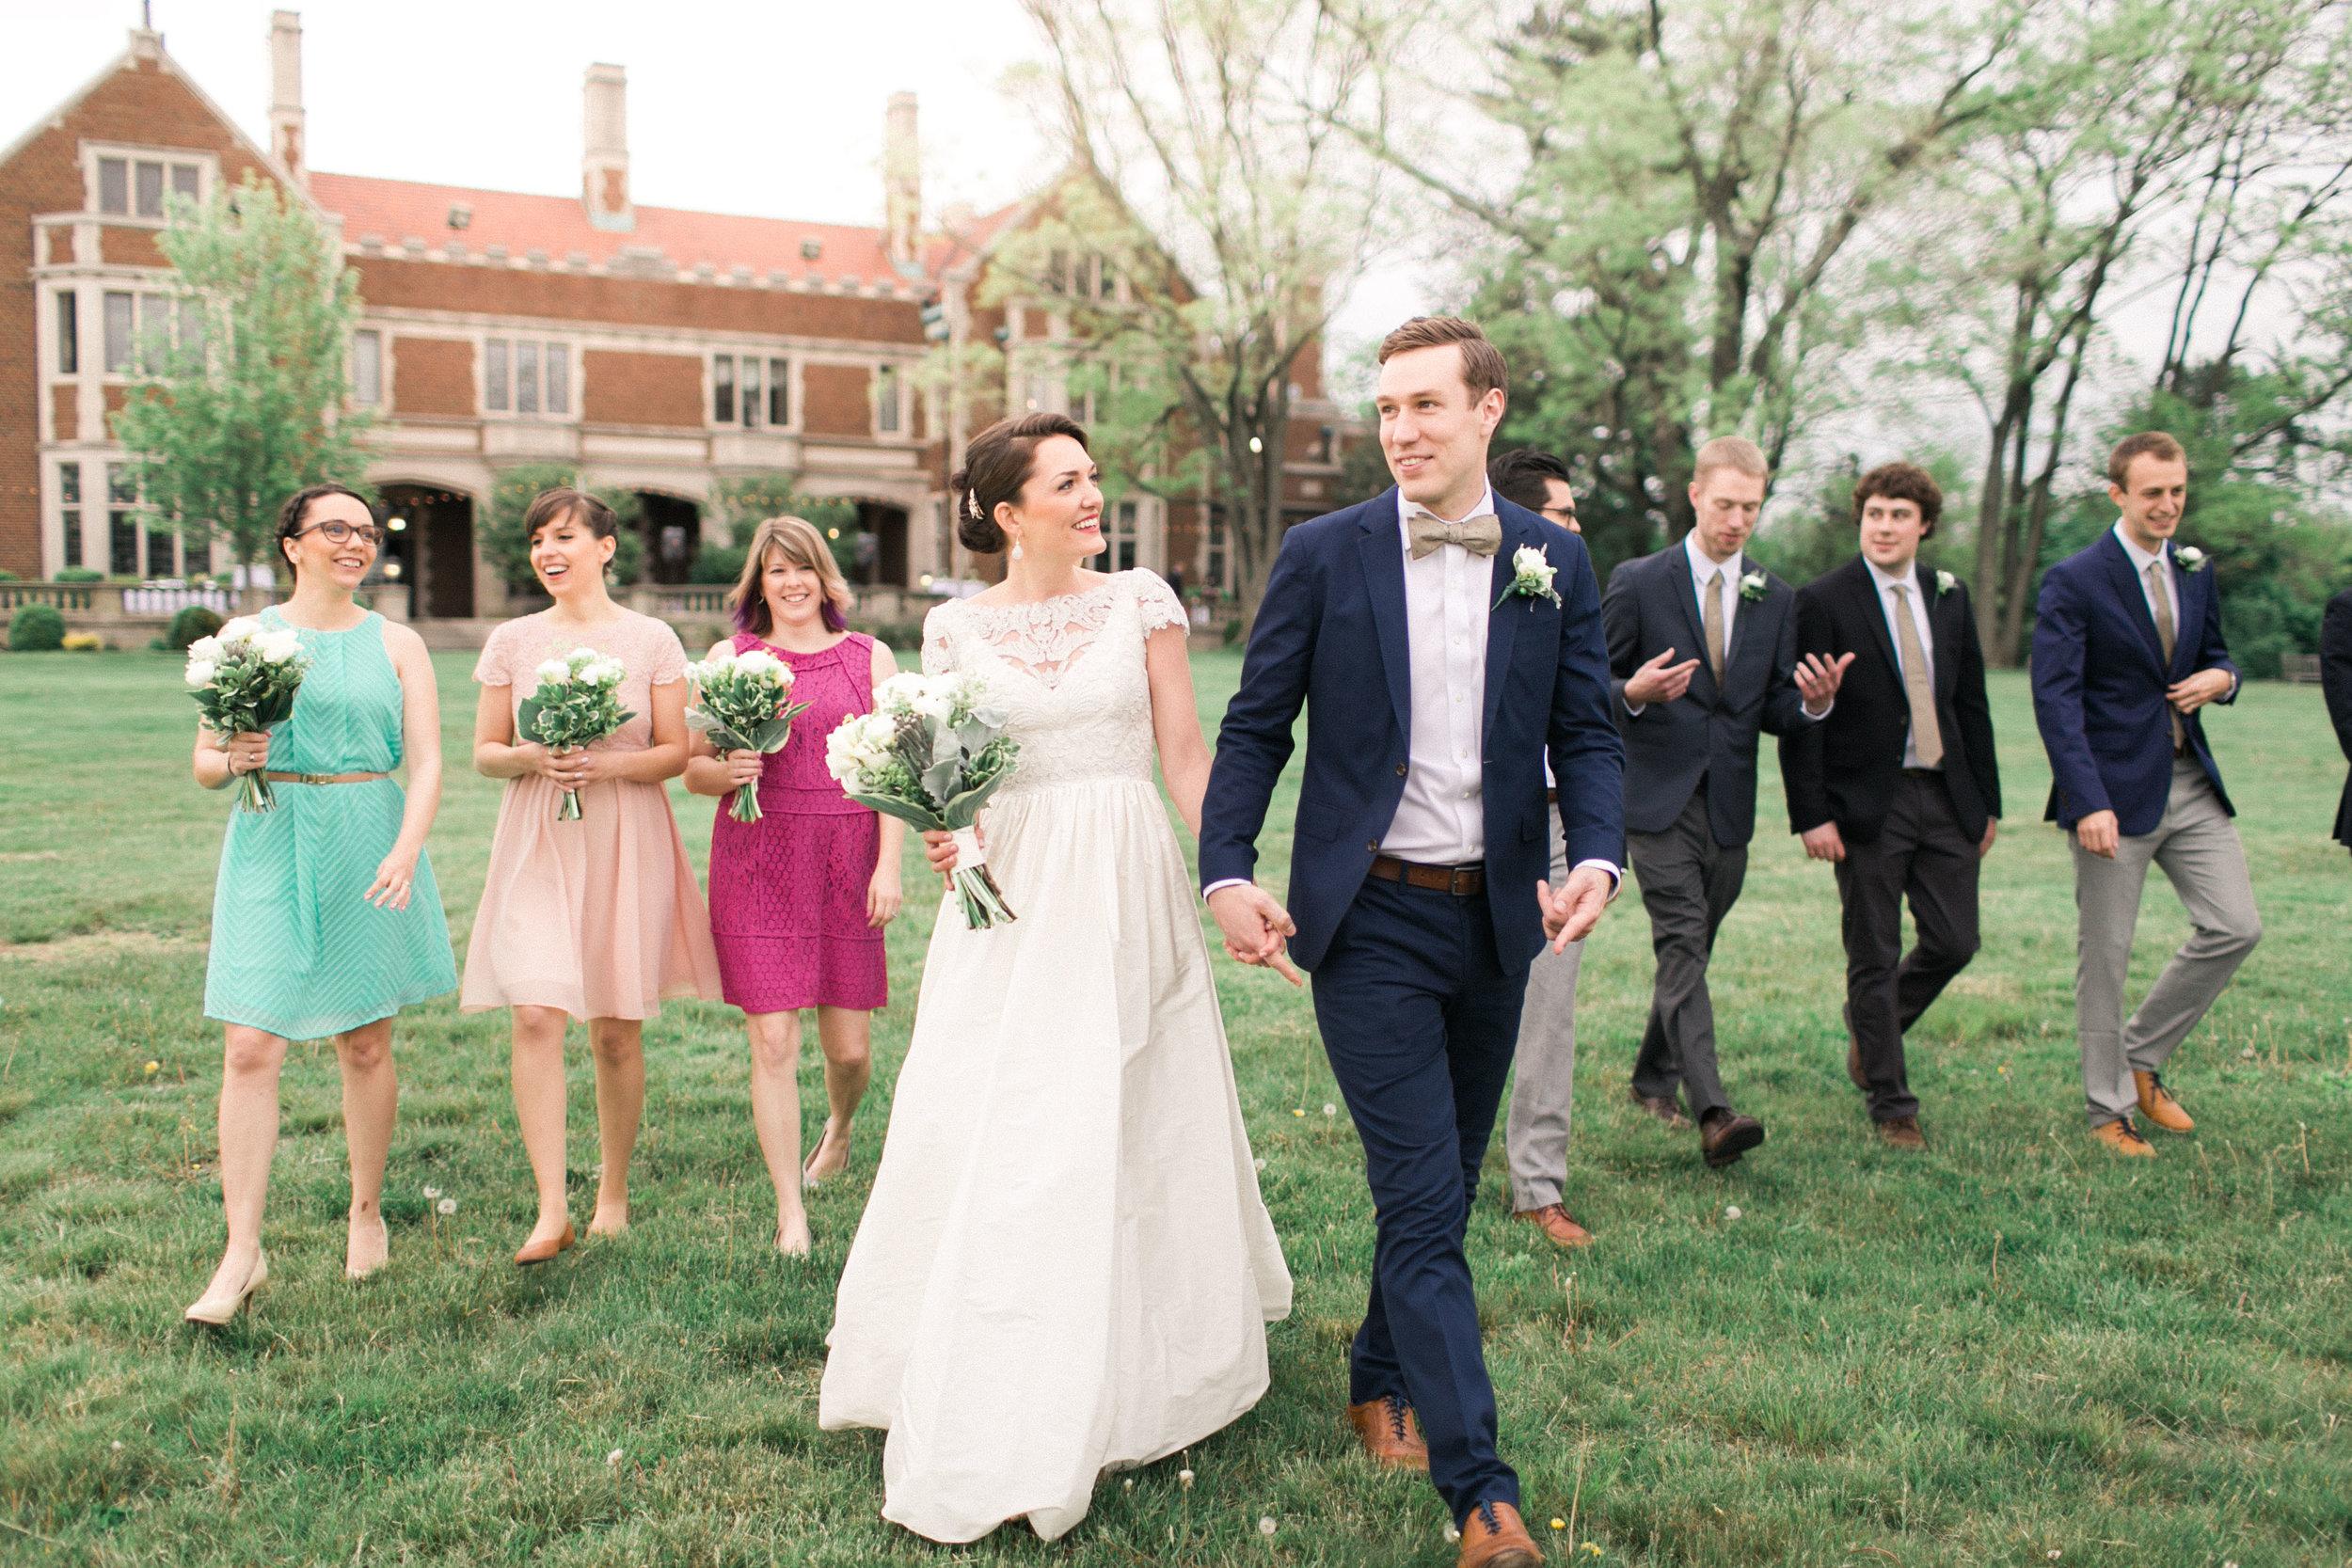 mayden photography weddings-45.jpg